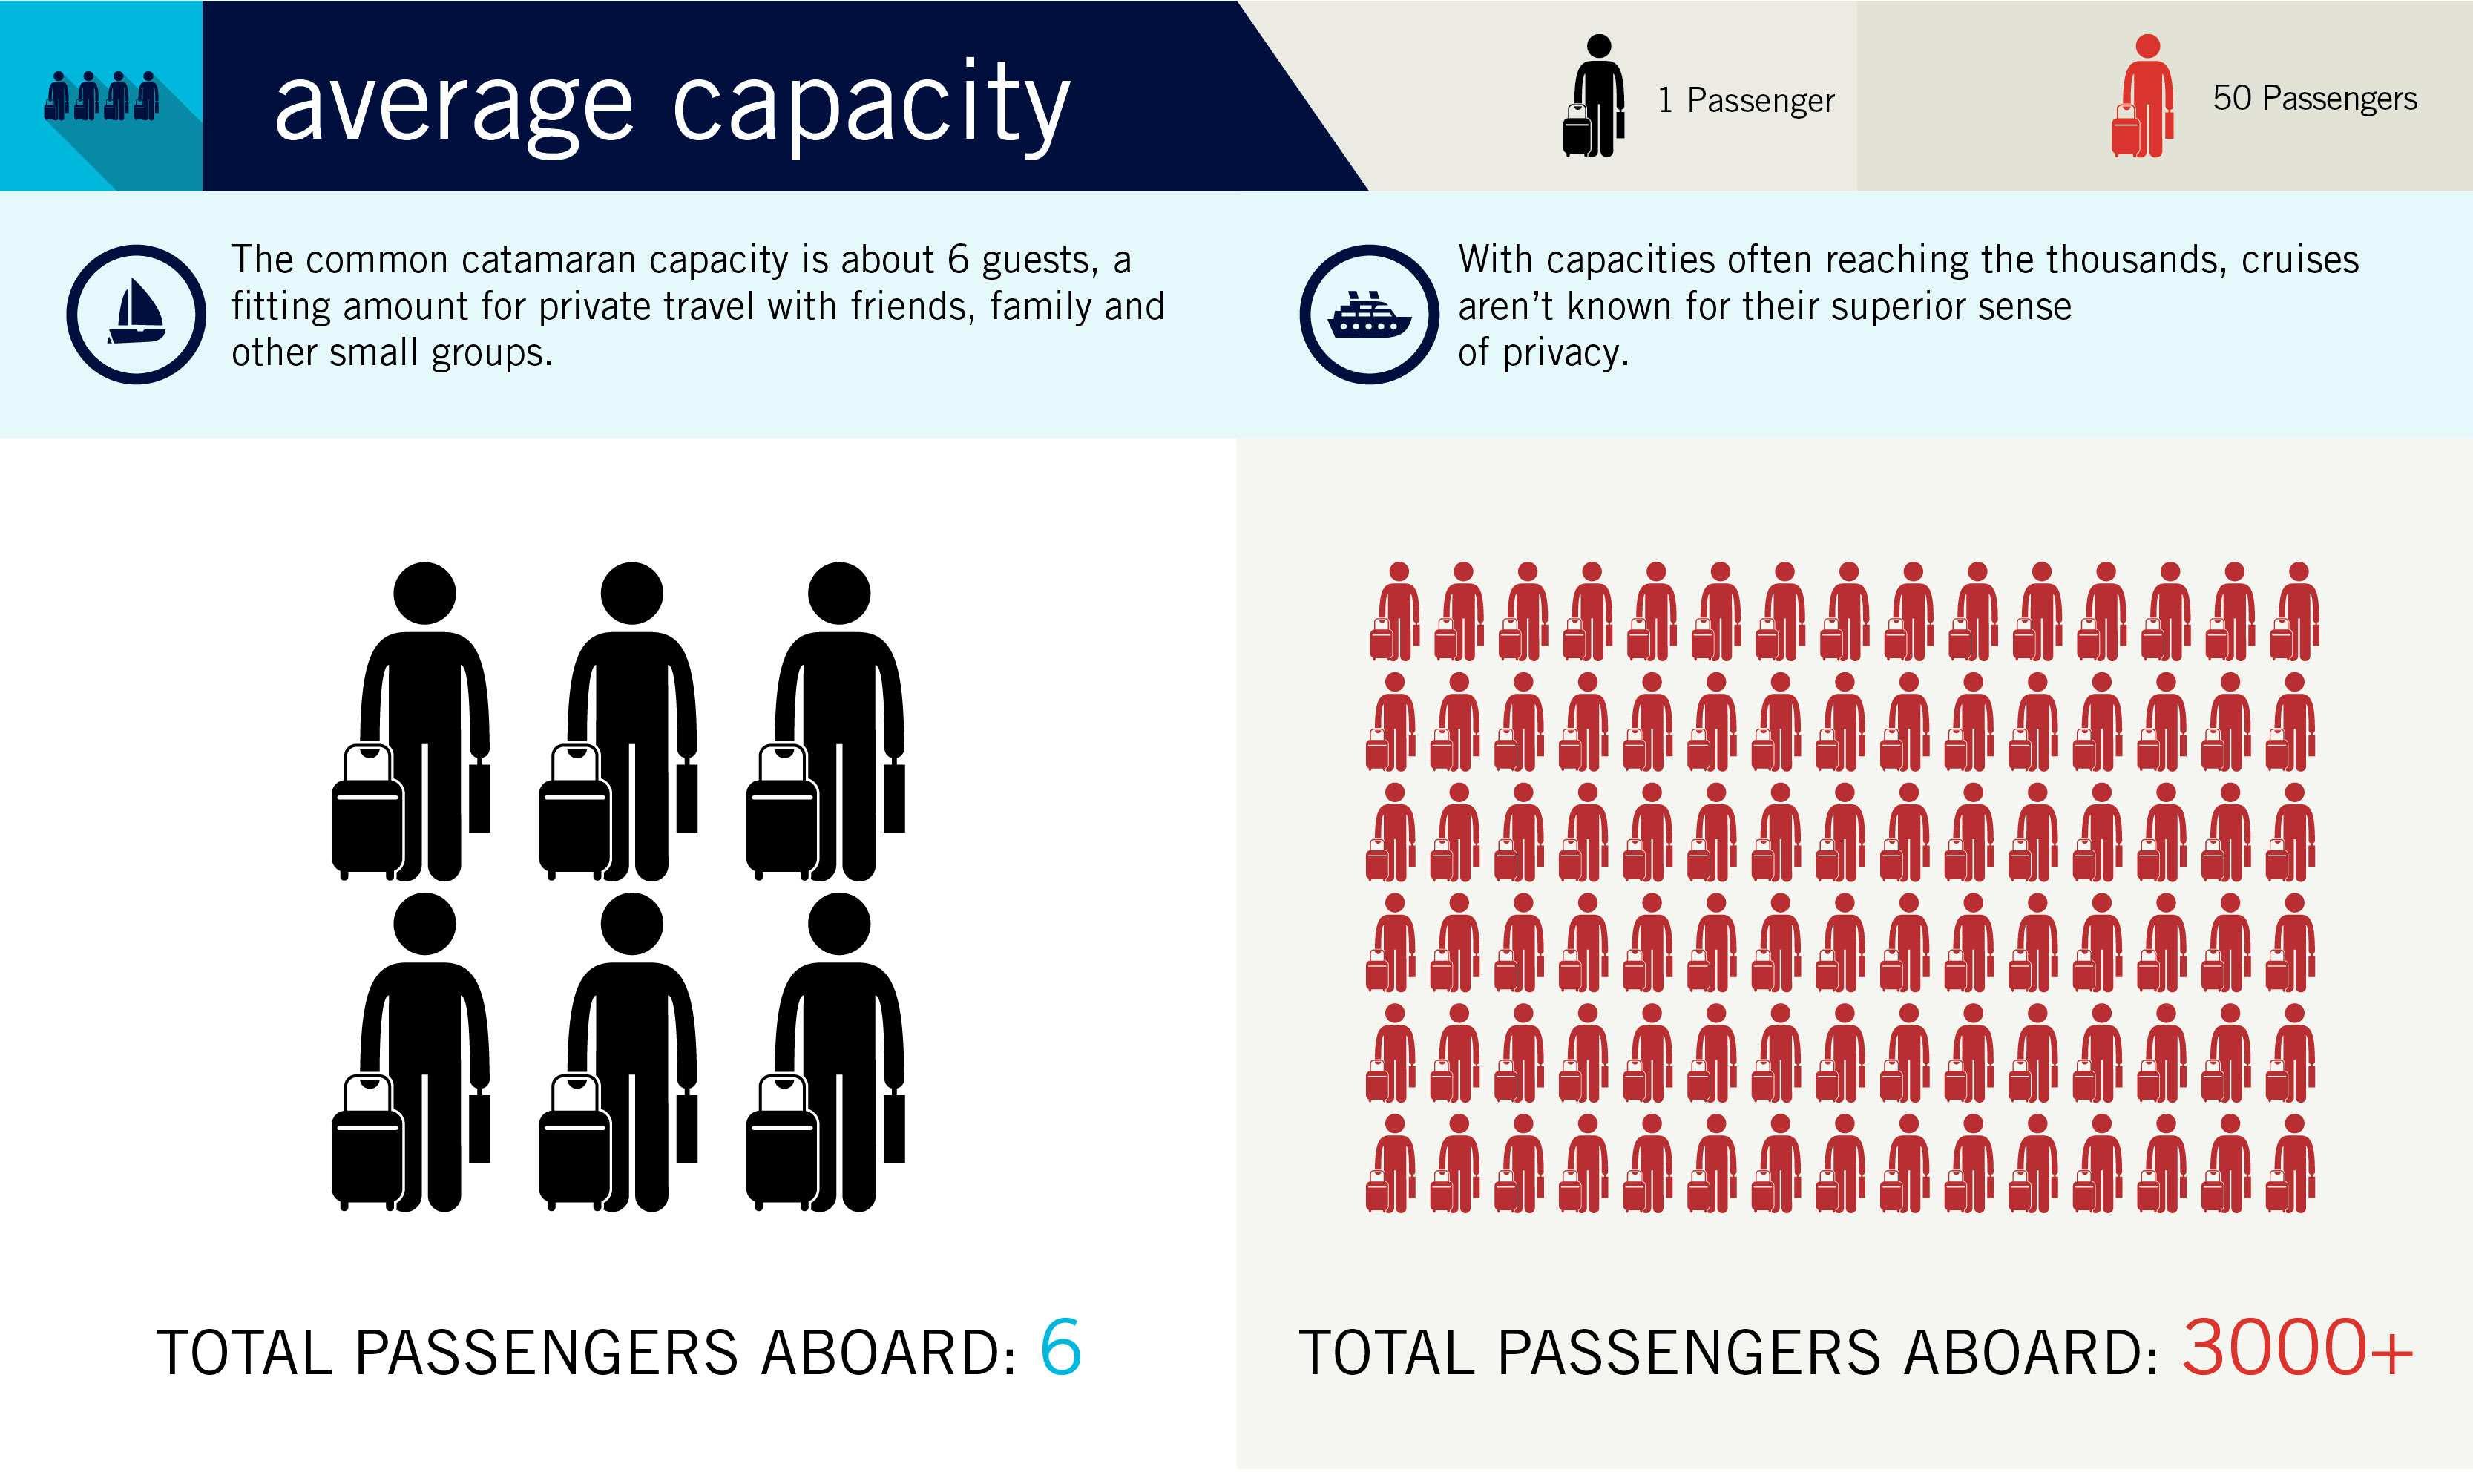 Average Capacity